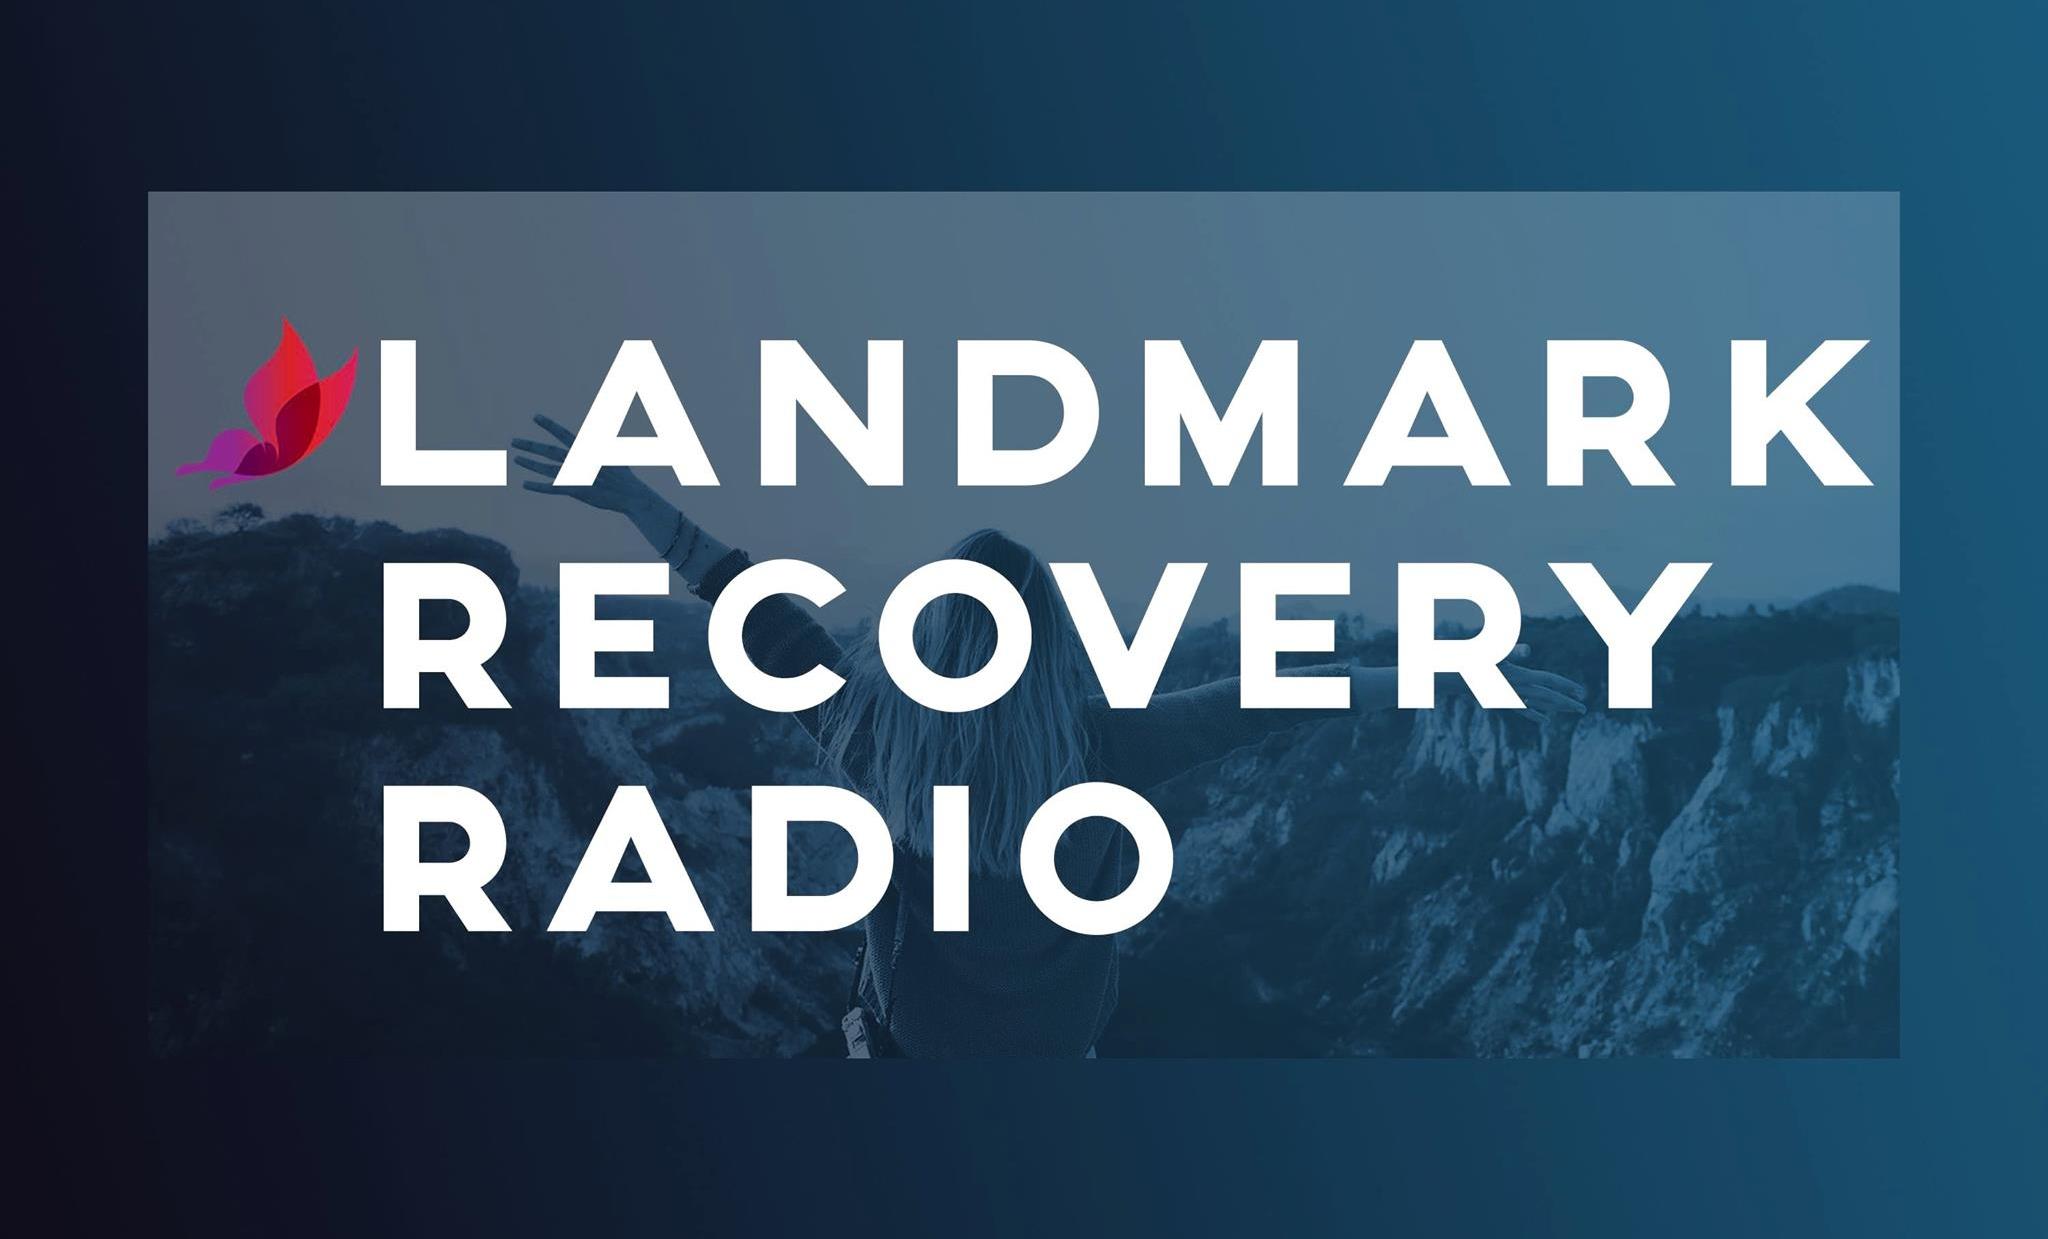 Ward Blanchard shares his personal story on Landmark Recovery Radio